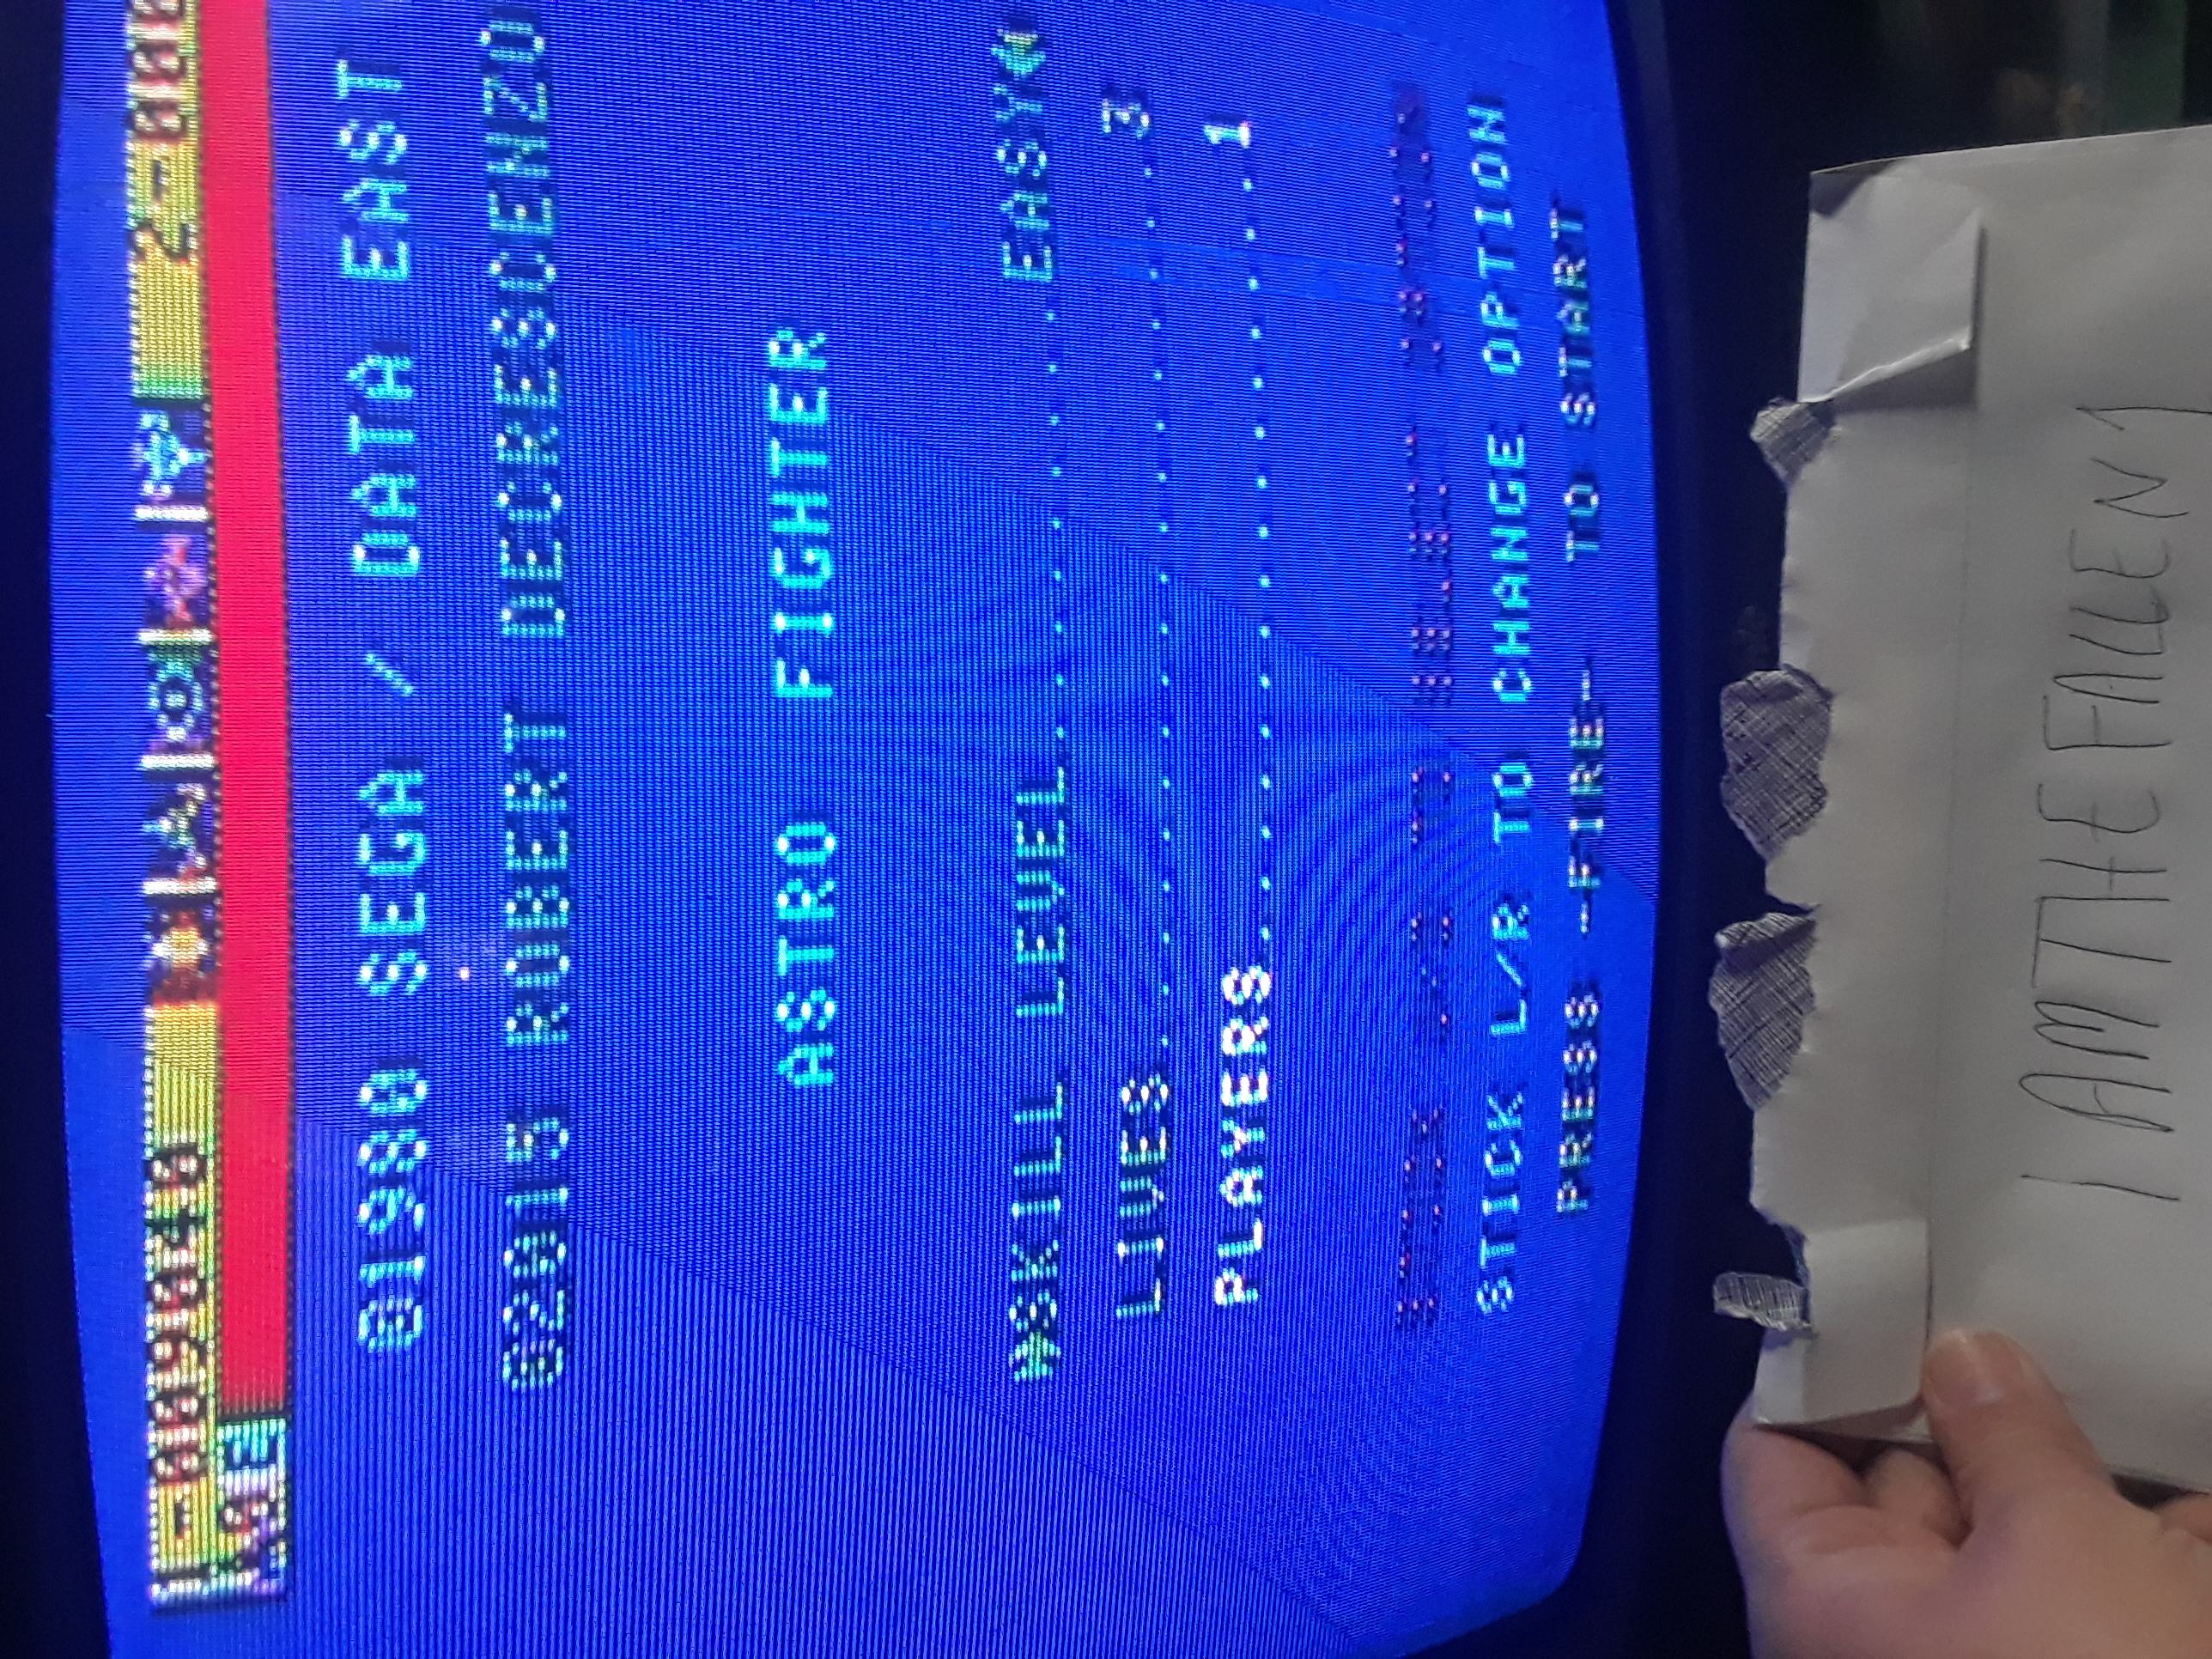 iamthefallen1: Astro Fighter [Easy / 3 Lives] (Atari 7800) 9,040 points on 2019-04-11 22:31:56